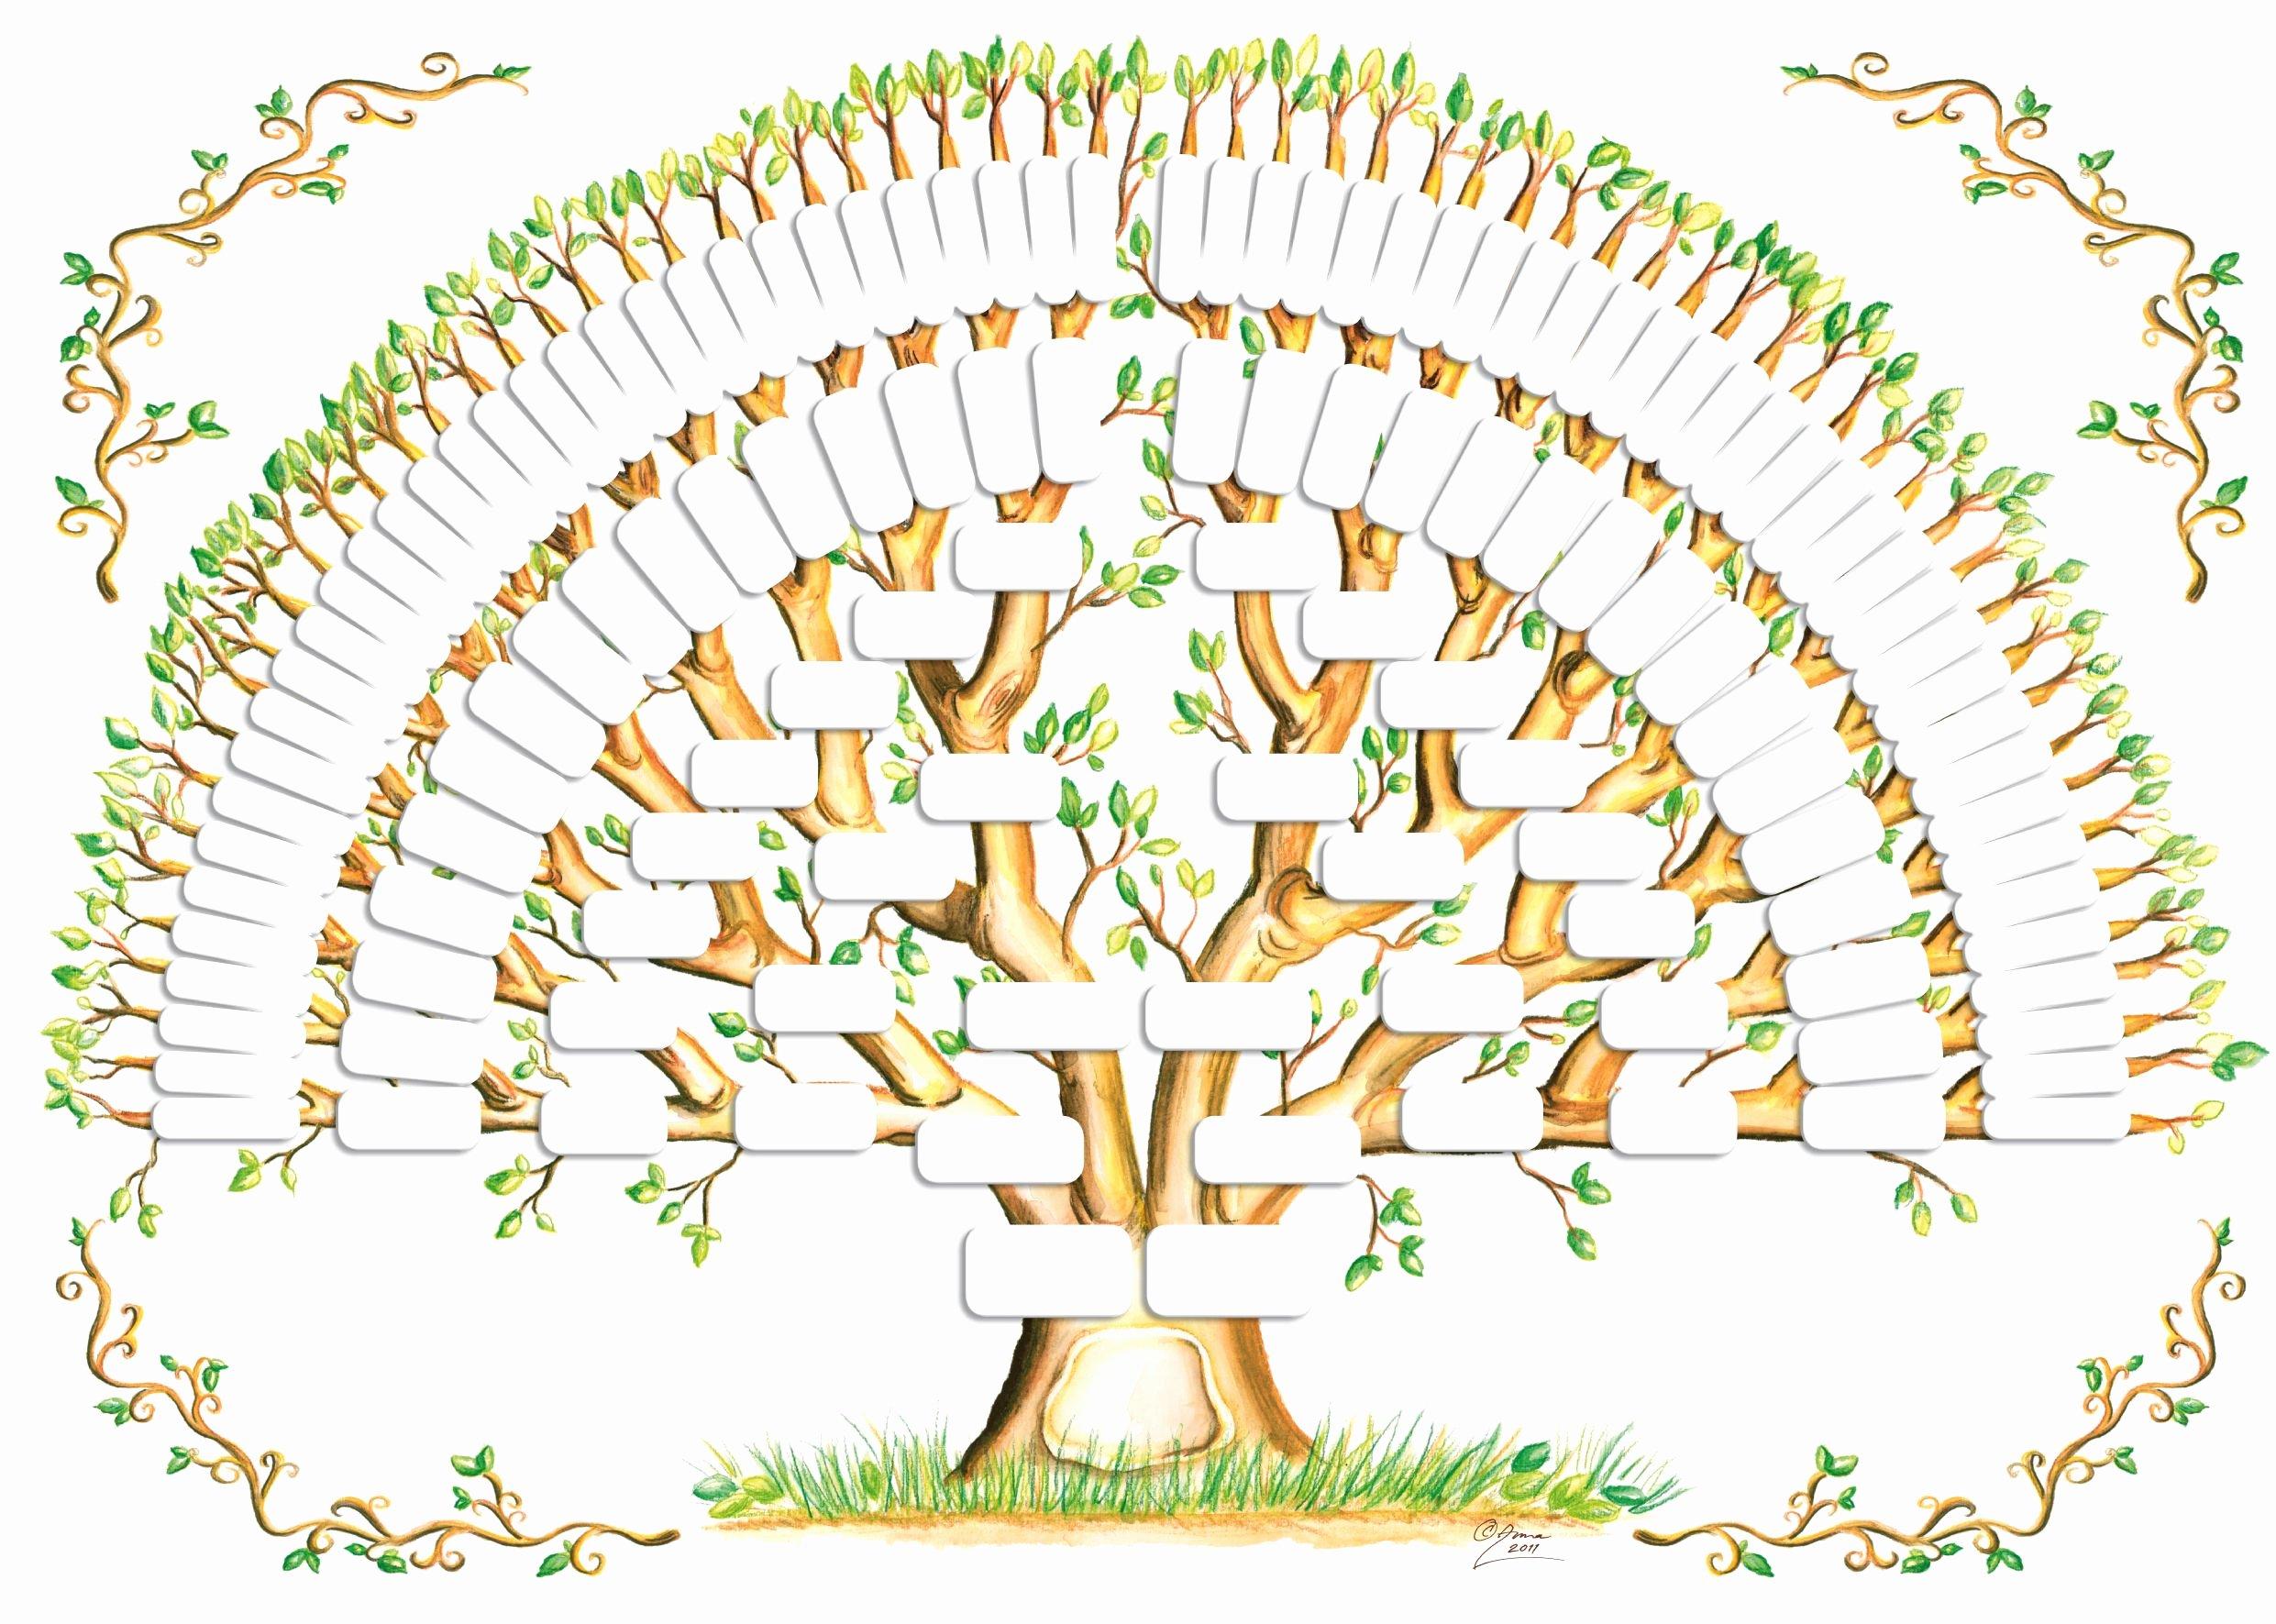 Family Tree Template Online Unique 5 Generation Family Tree Template Tree Gallery